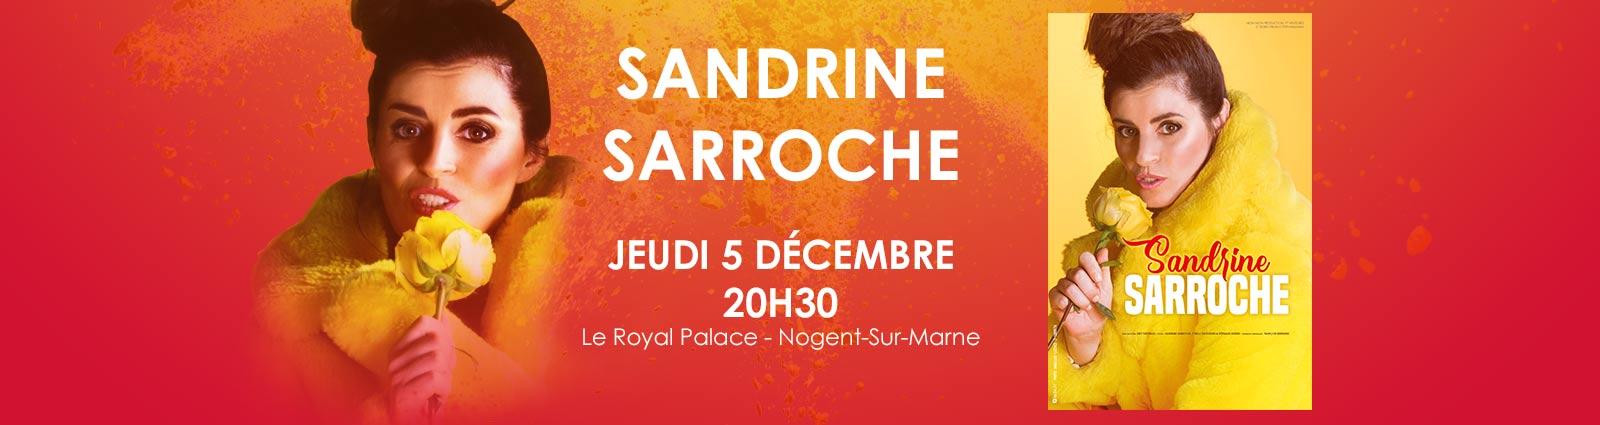 Sandrine Sarroche